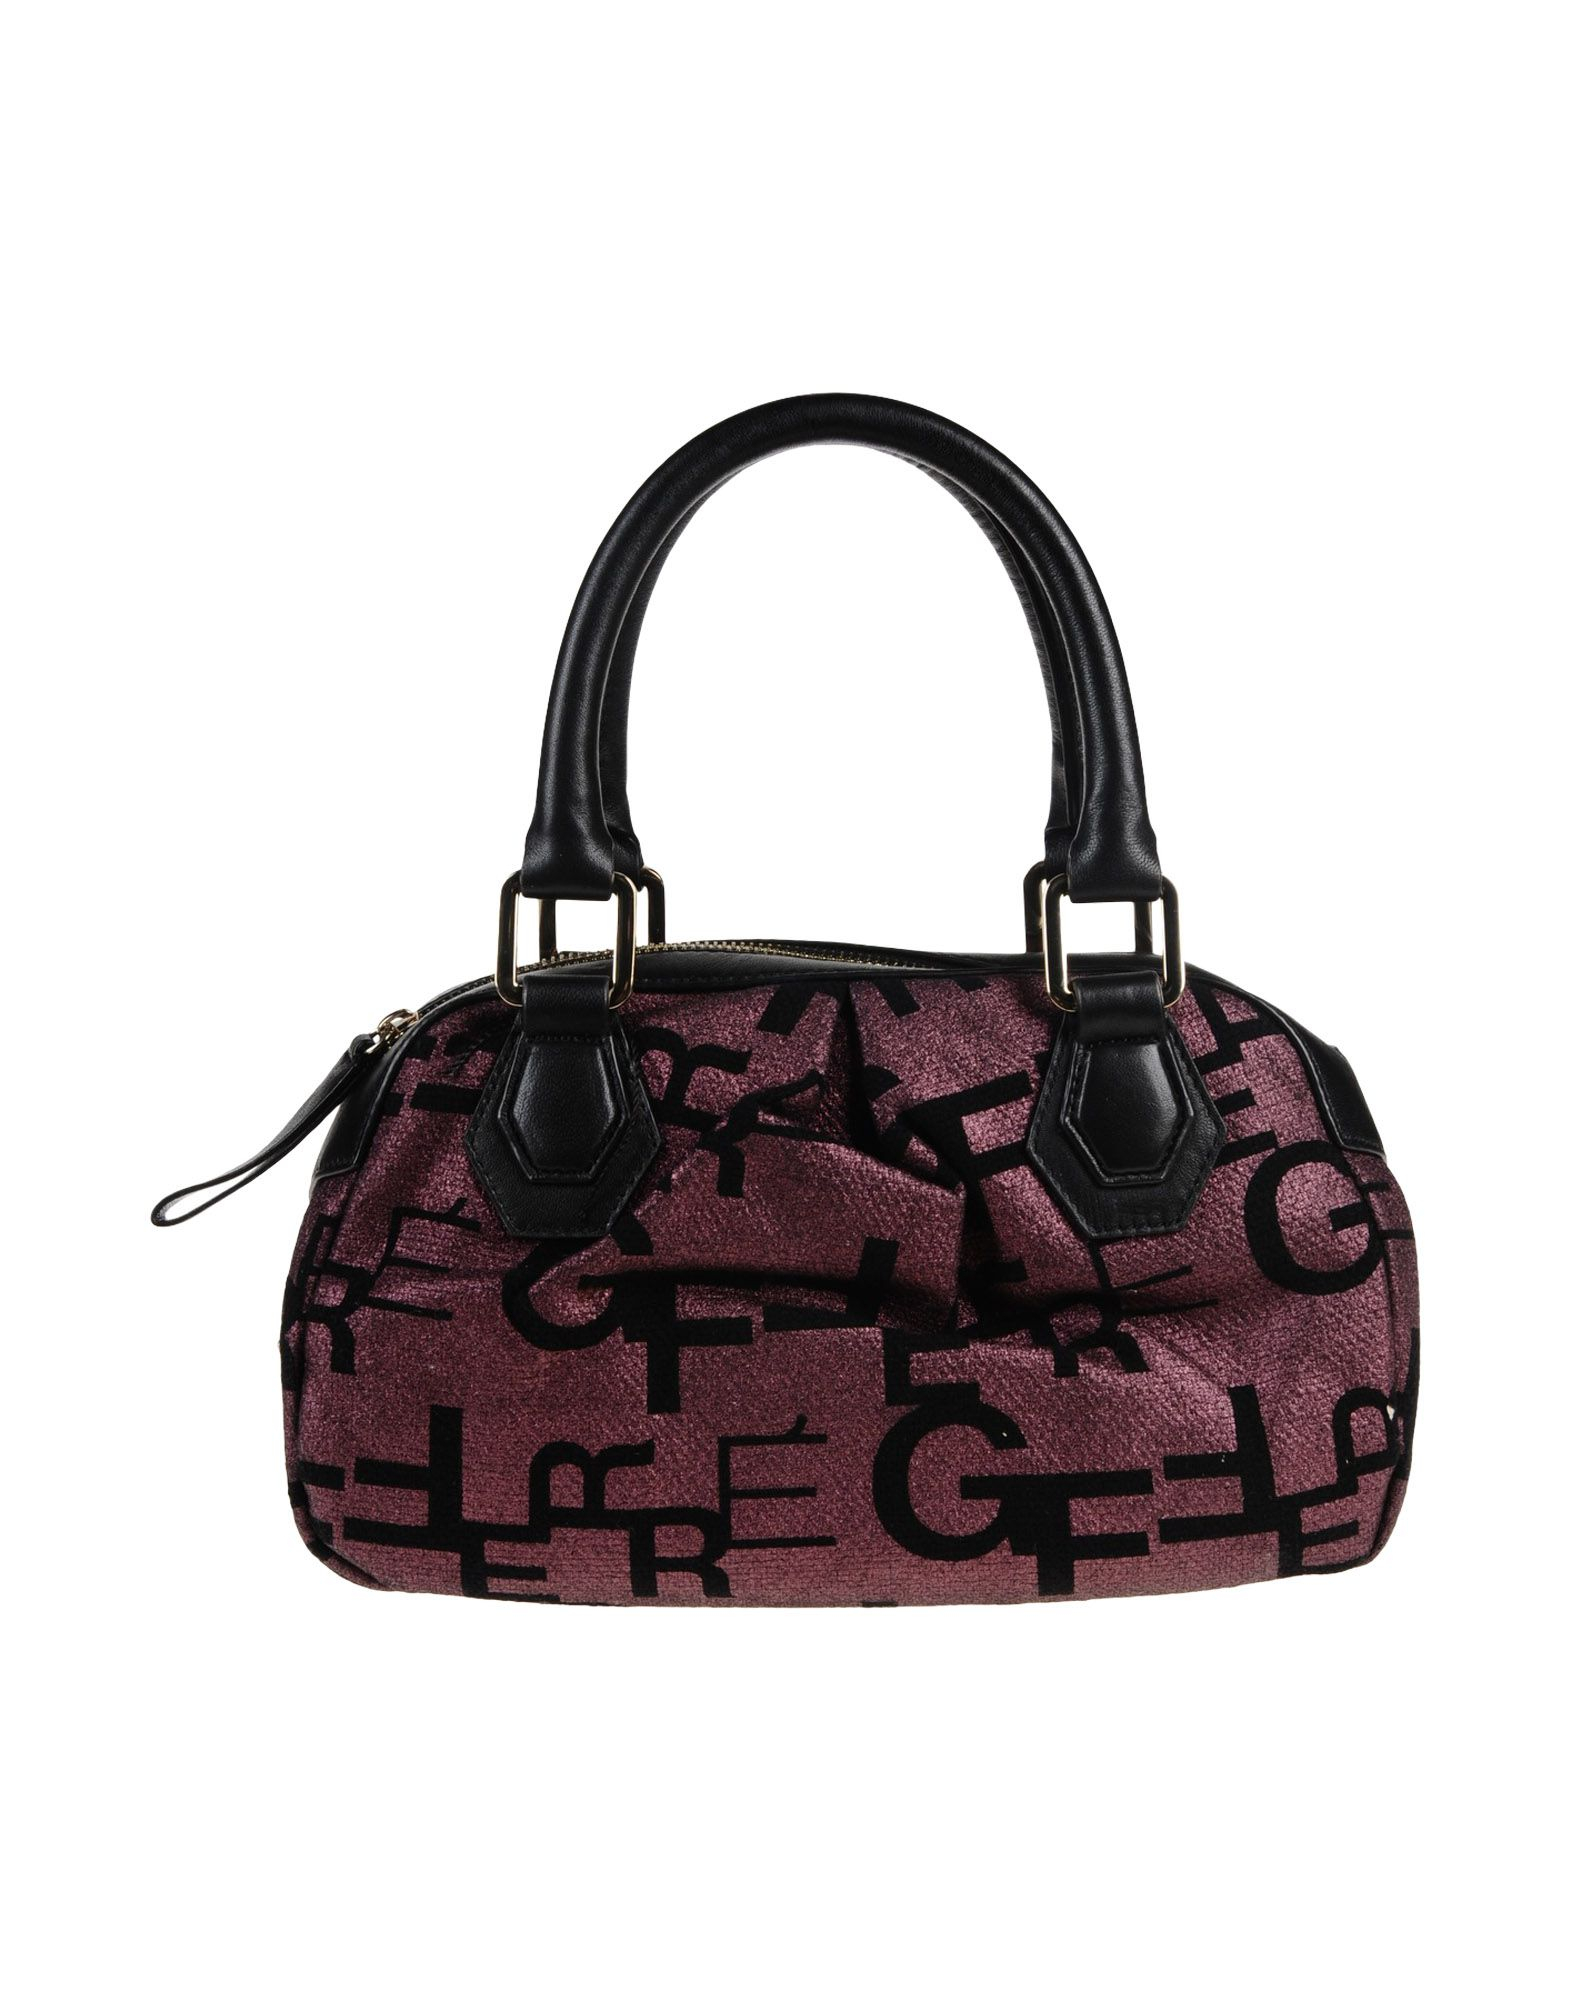 Gianfranco Ferré Handbag in Purple (Deep purple)